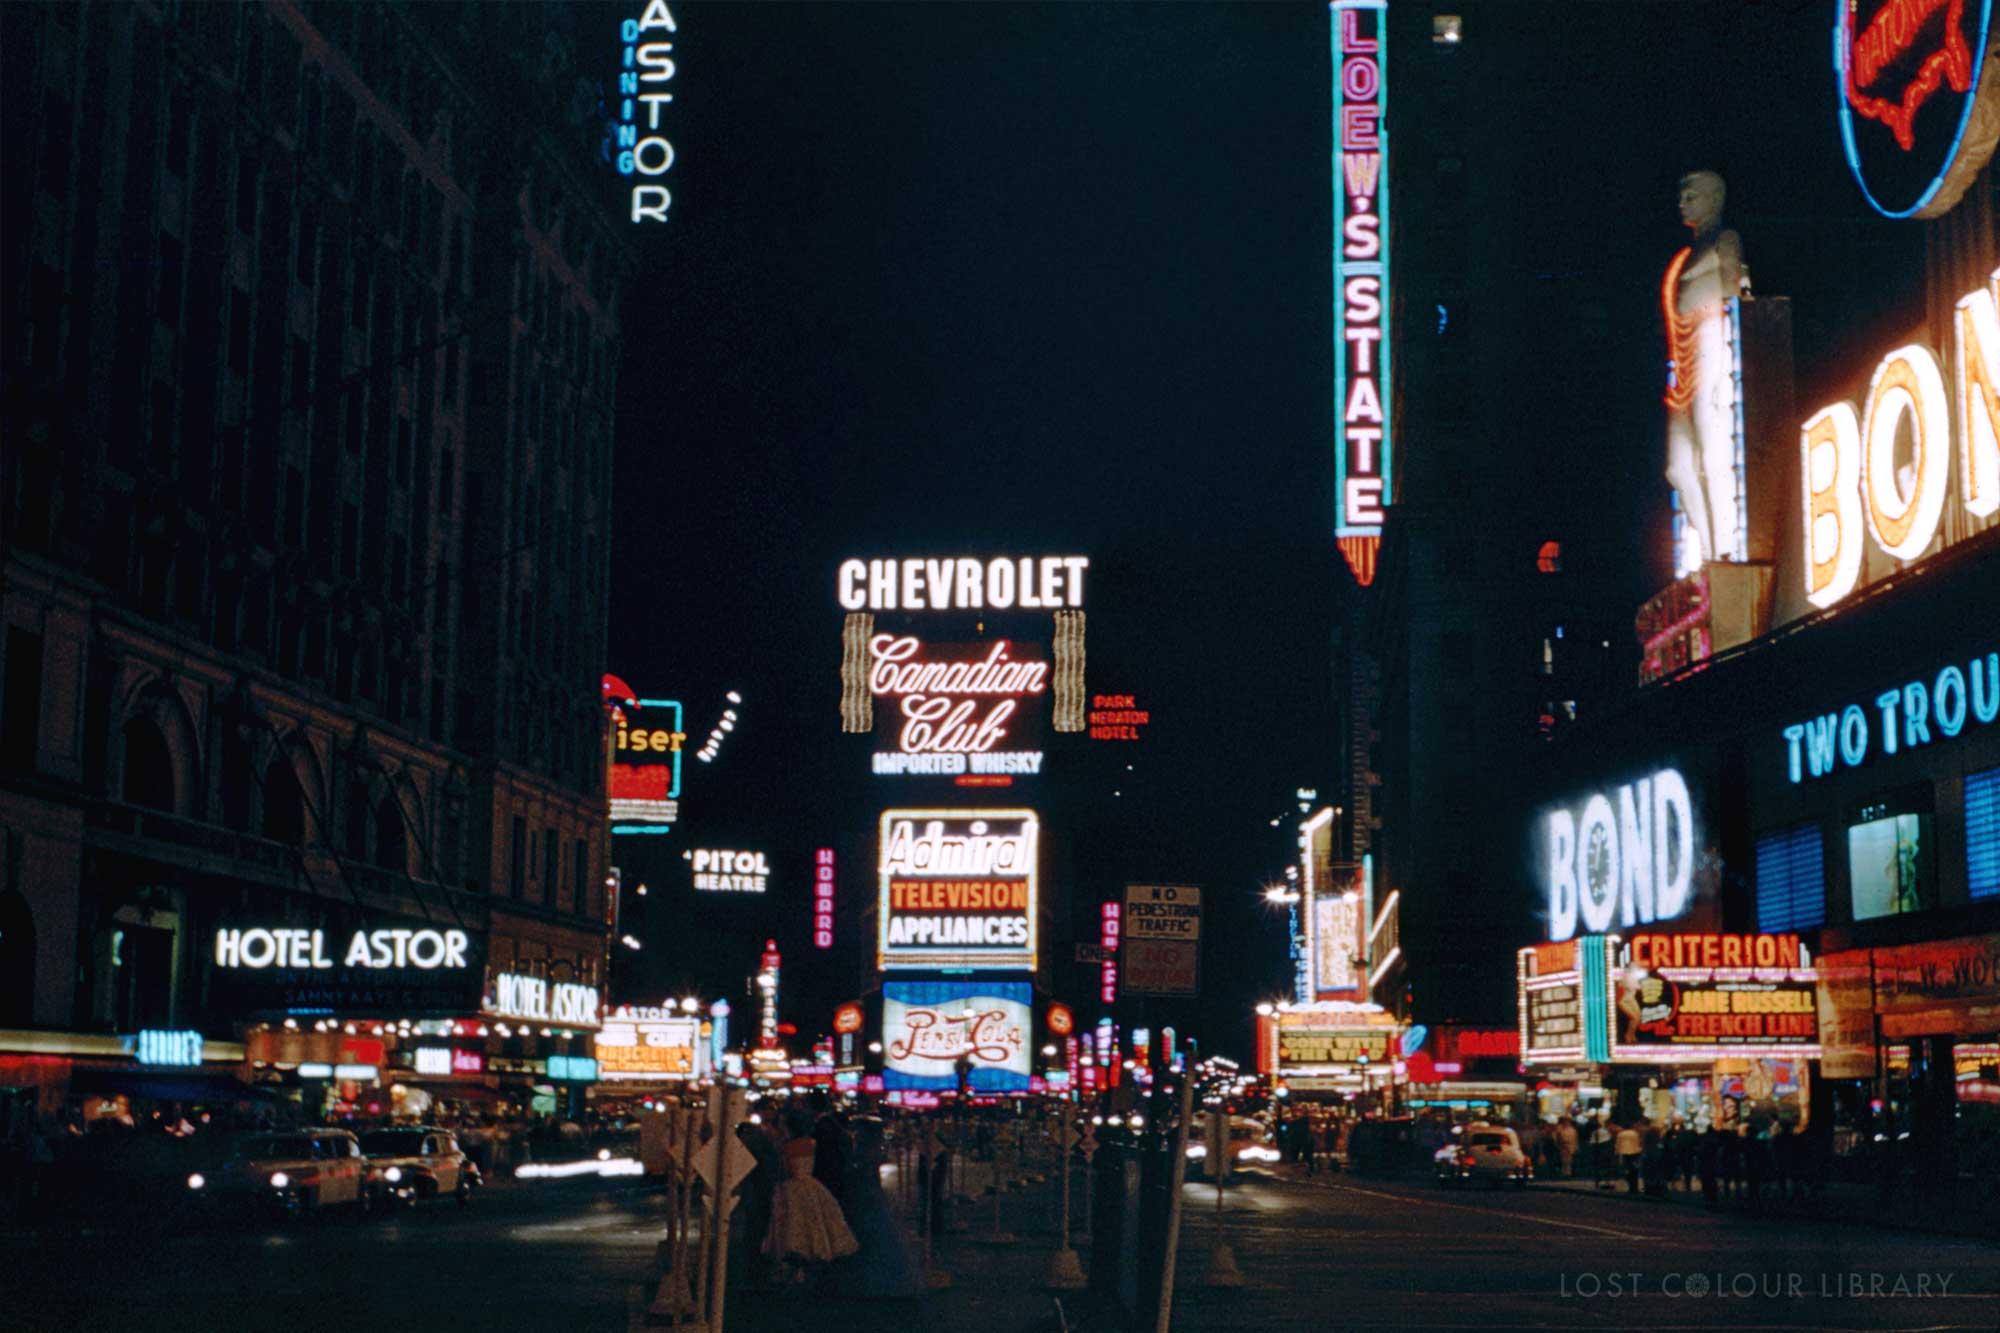 lcl-ww-times-sqaure-night-1953-site-wm.jpg